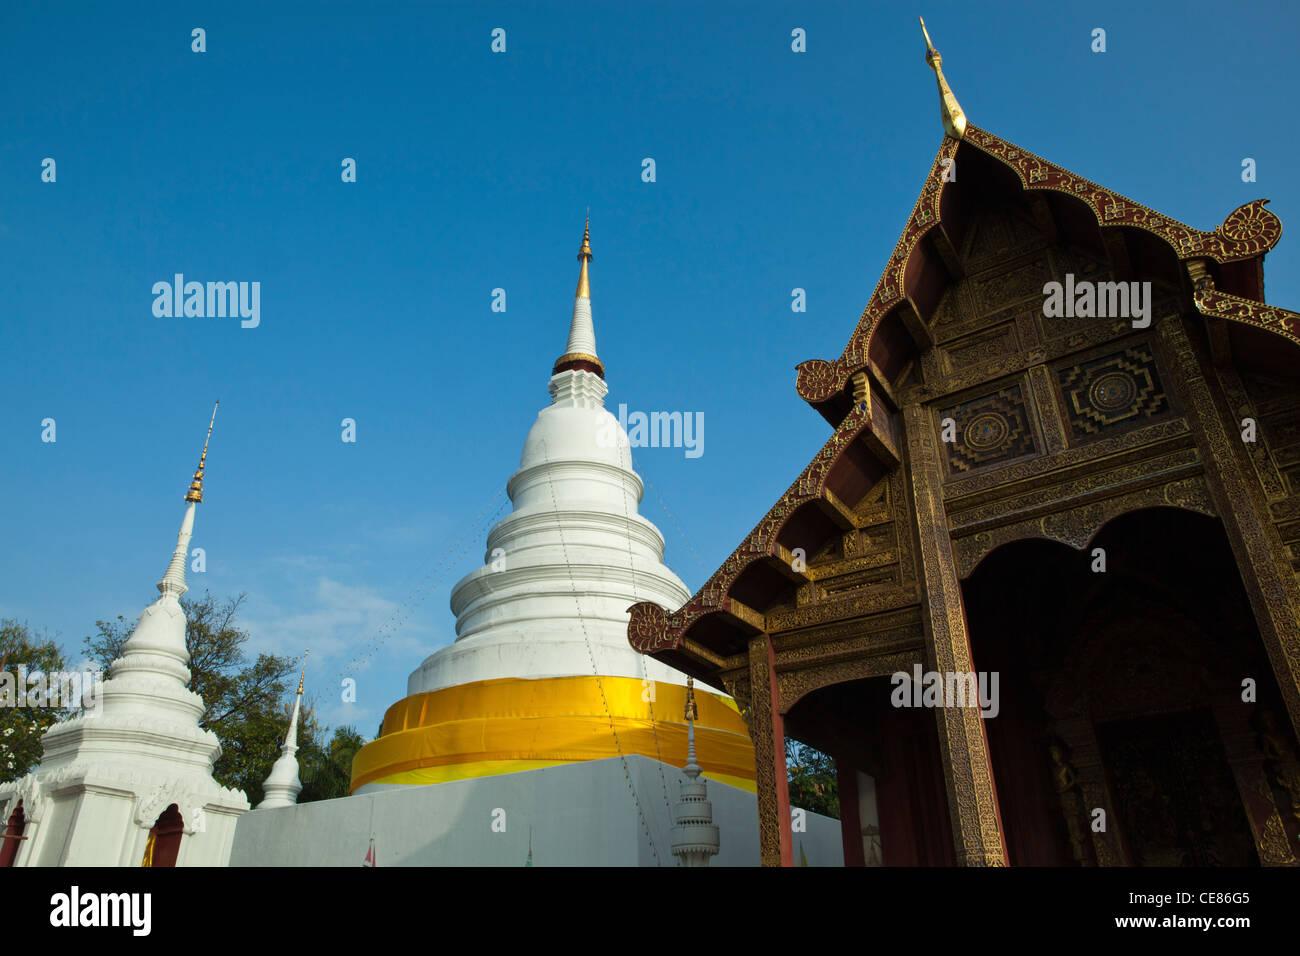 Wat Phra Singh Woramahaviharn is a Buddhist temple in Chiang Mai. Stock Photo